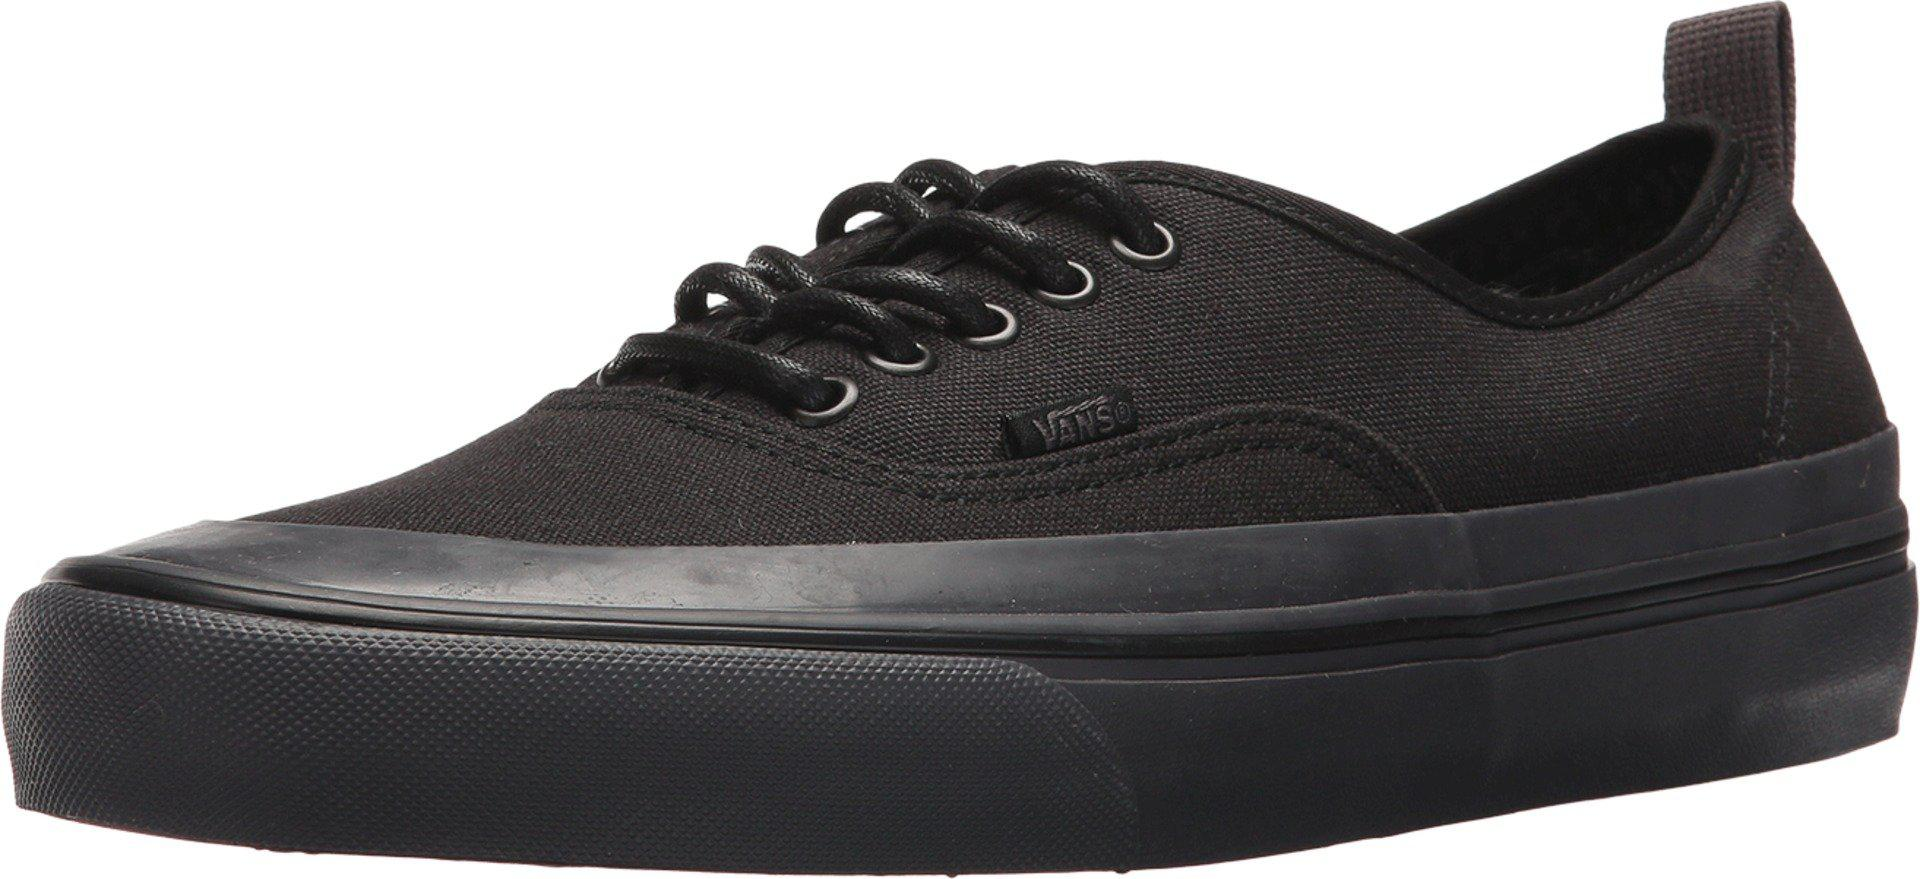 8965bb1024940f Lyst - Vans Authentic Hf in Black